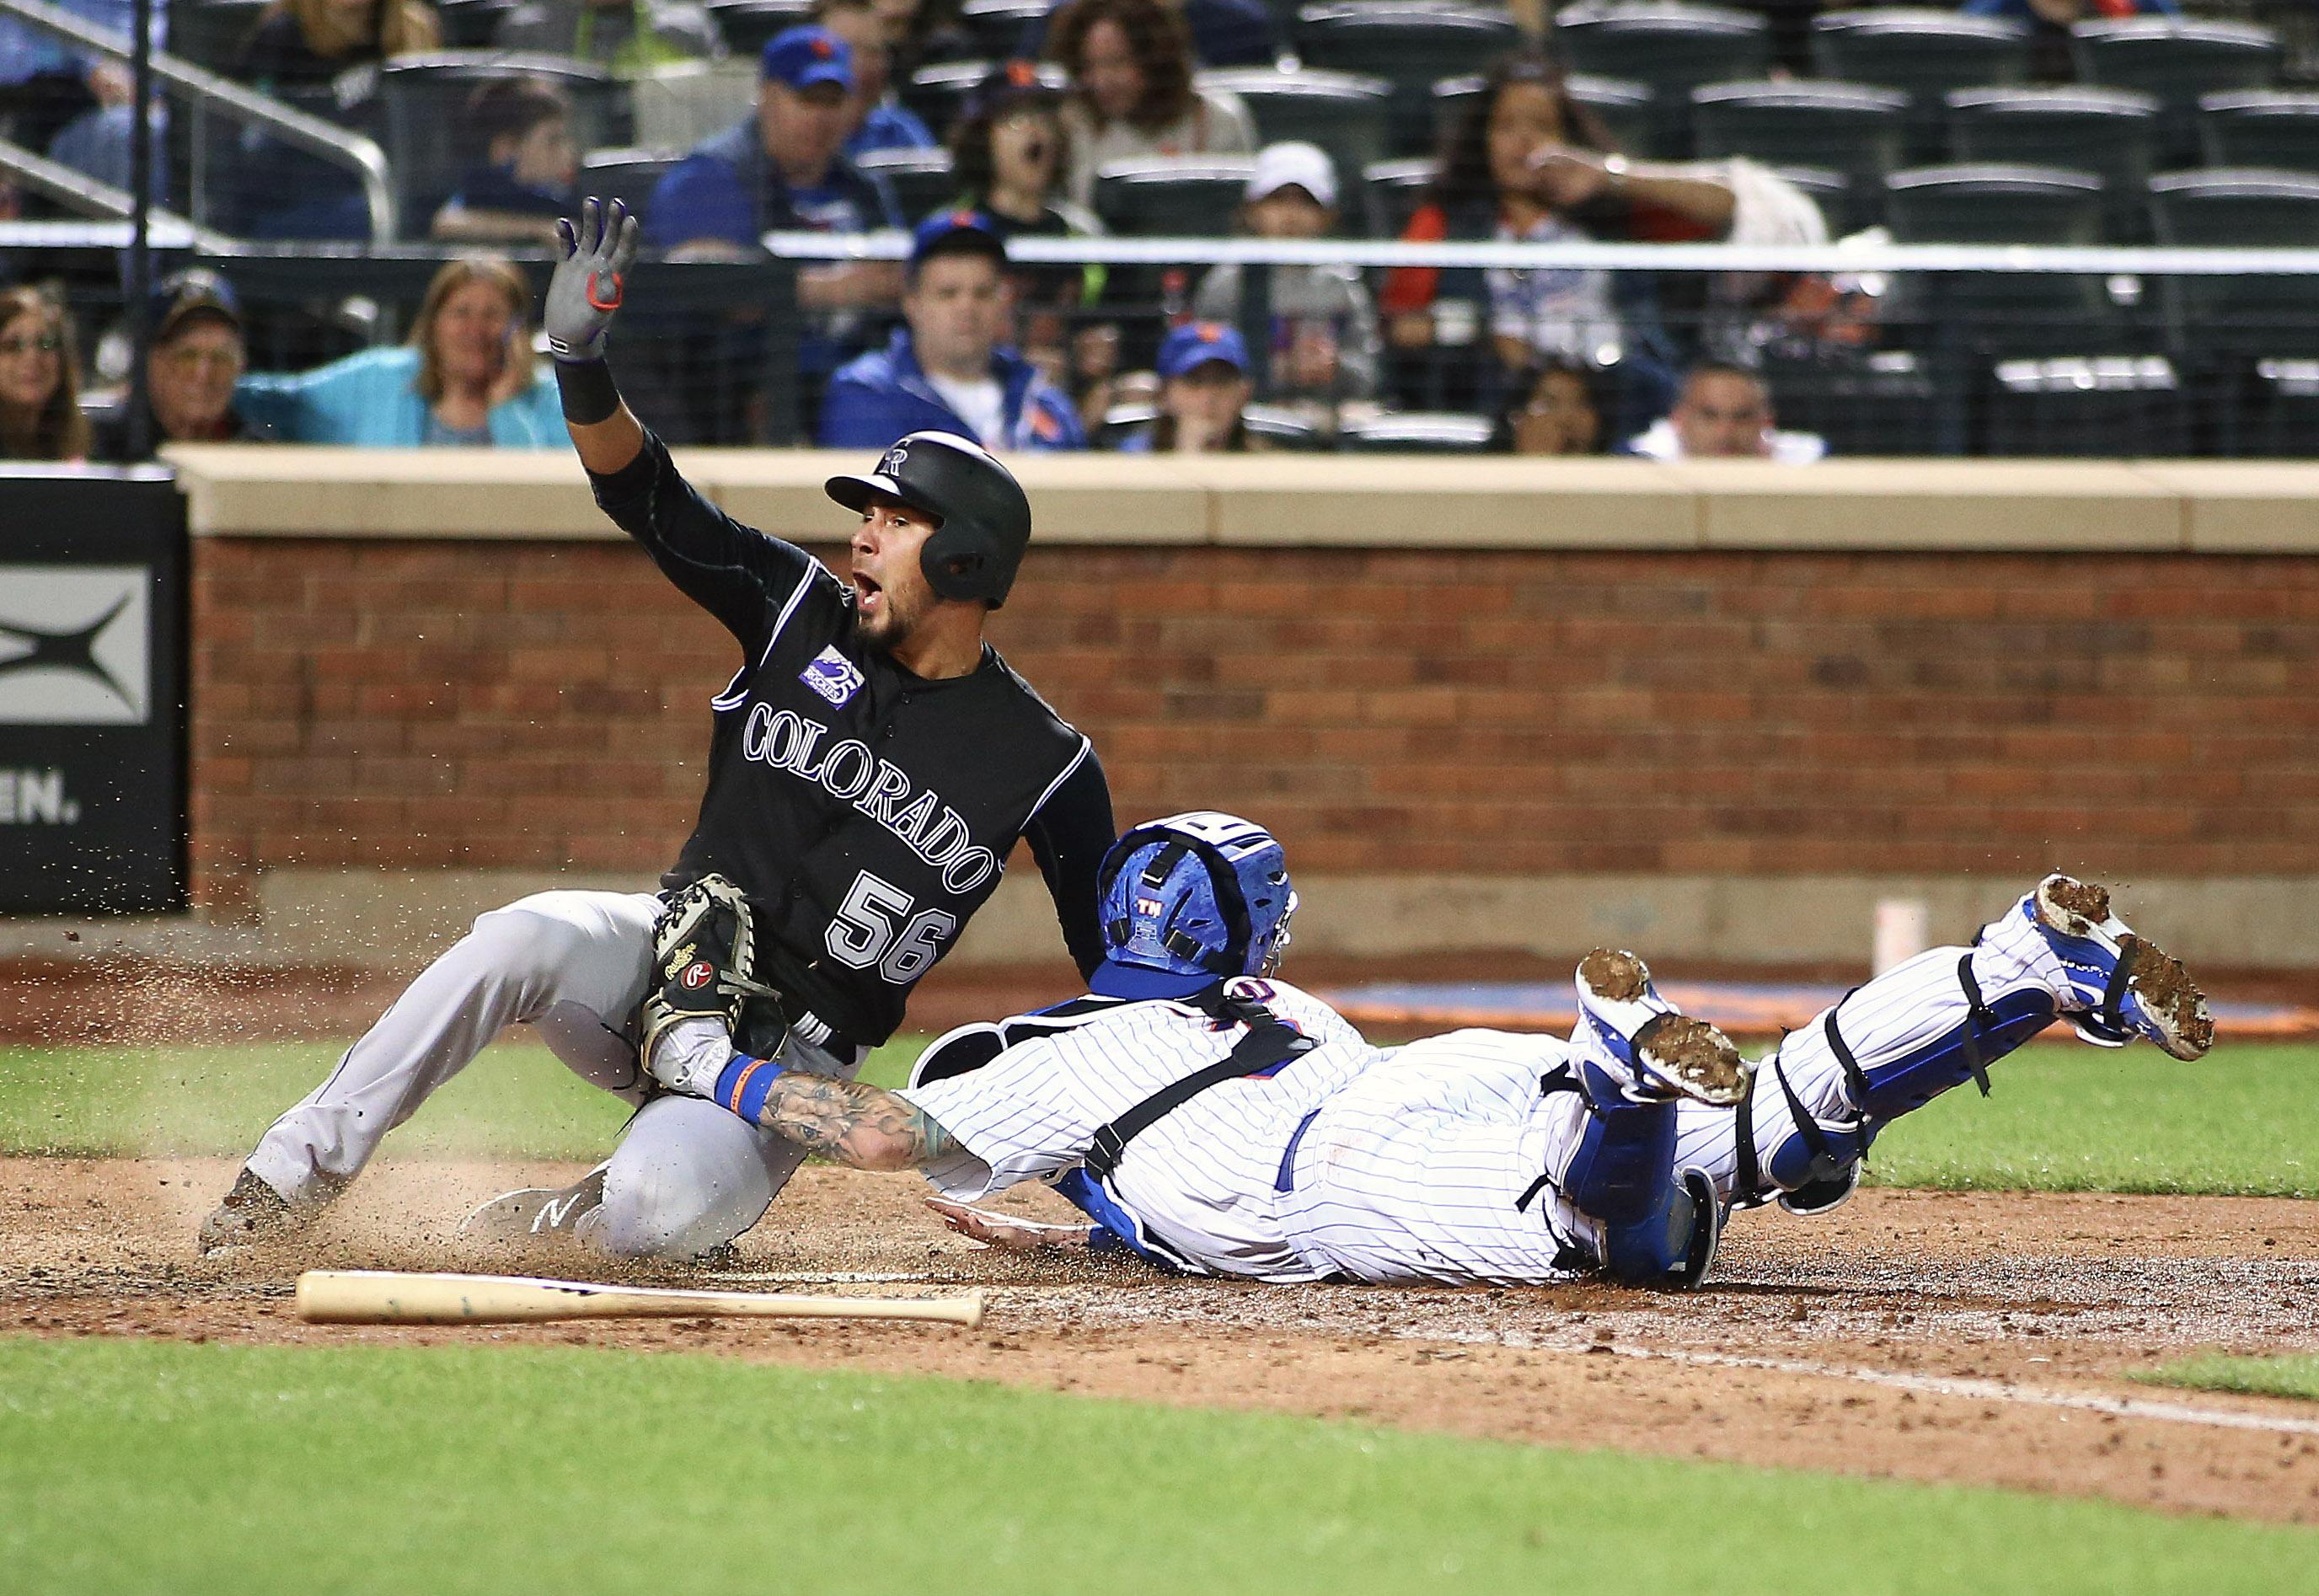 5/6/18 Game Preview: Colorado Rockies at New York Mets